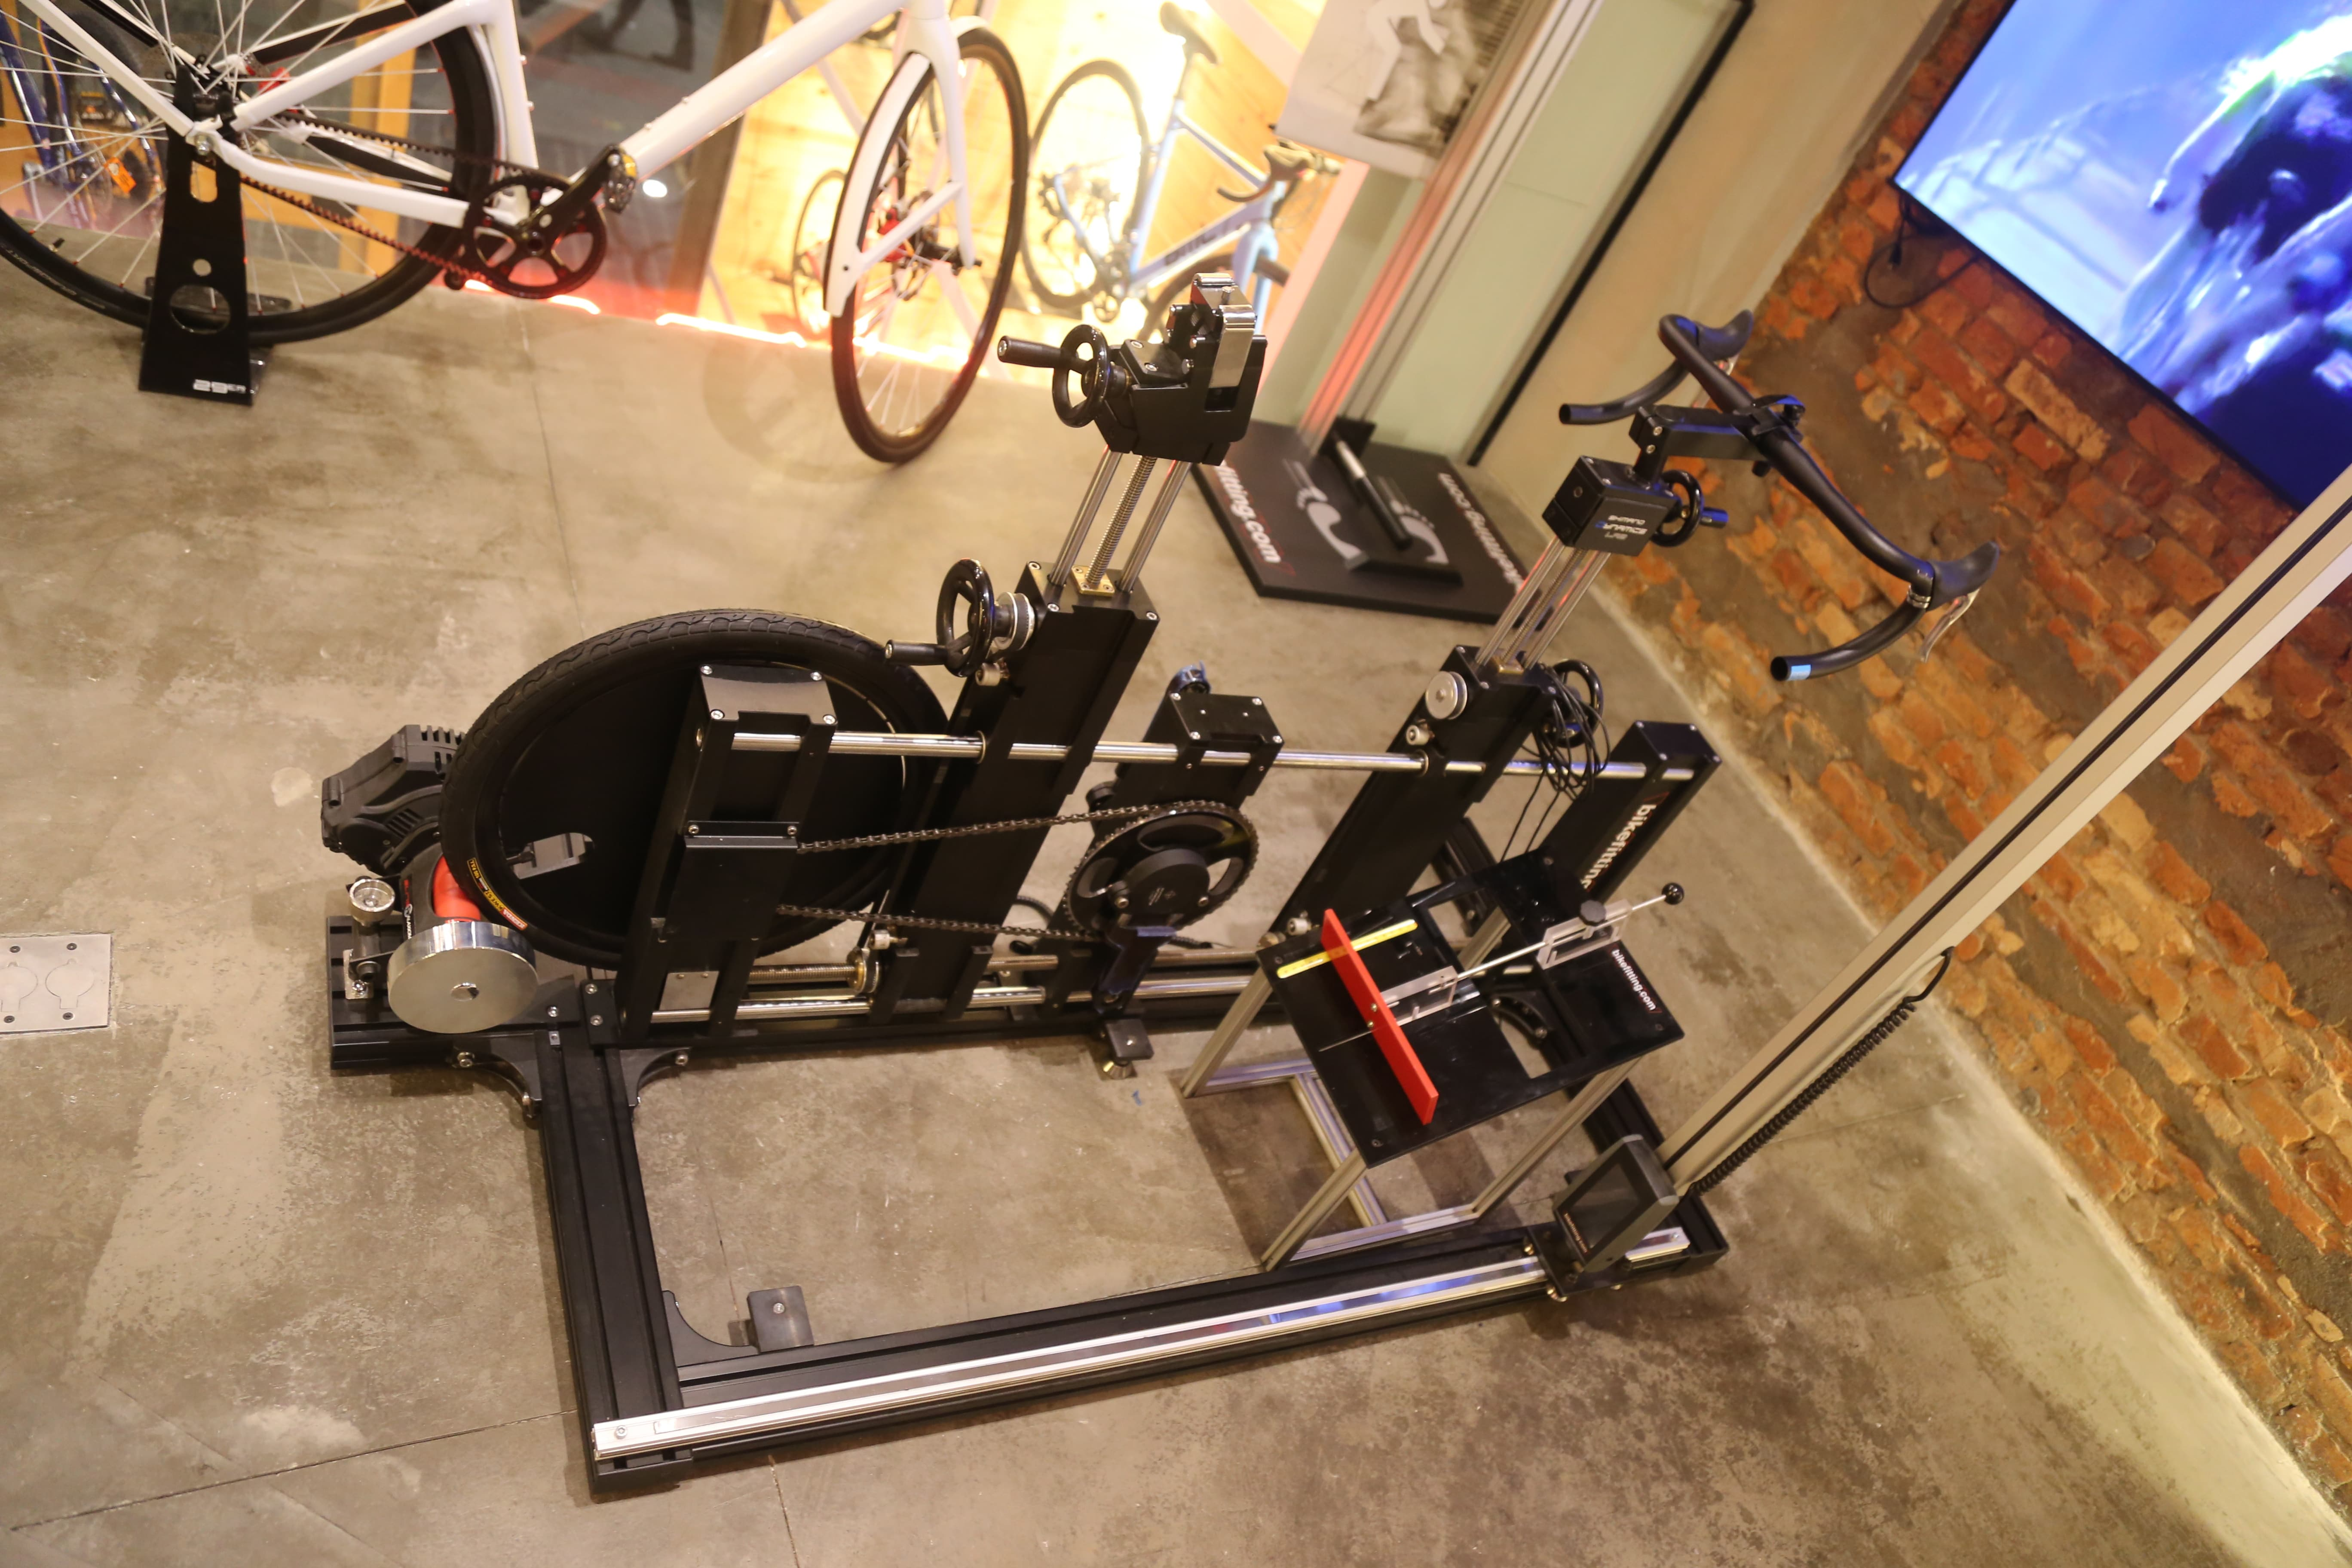 Bike Fit exposto na loja da Bicicletaria Faria Lima